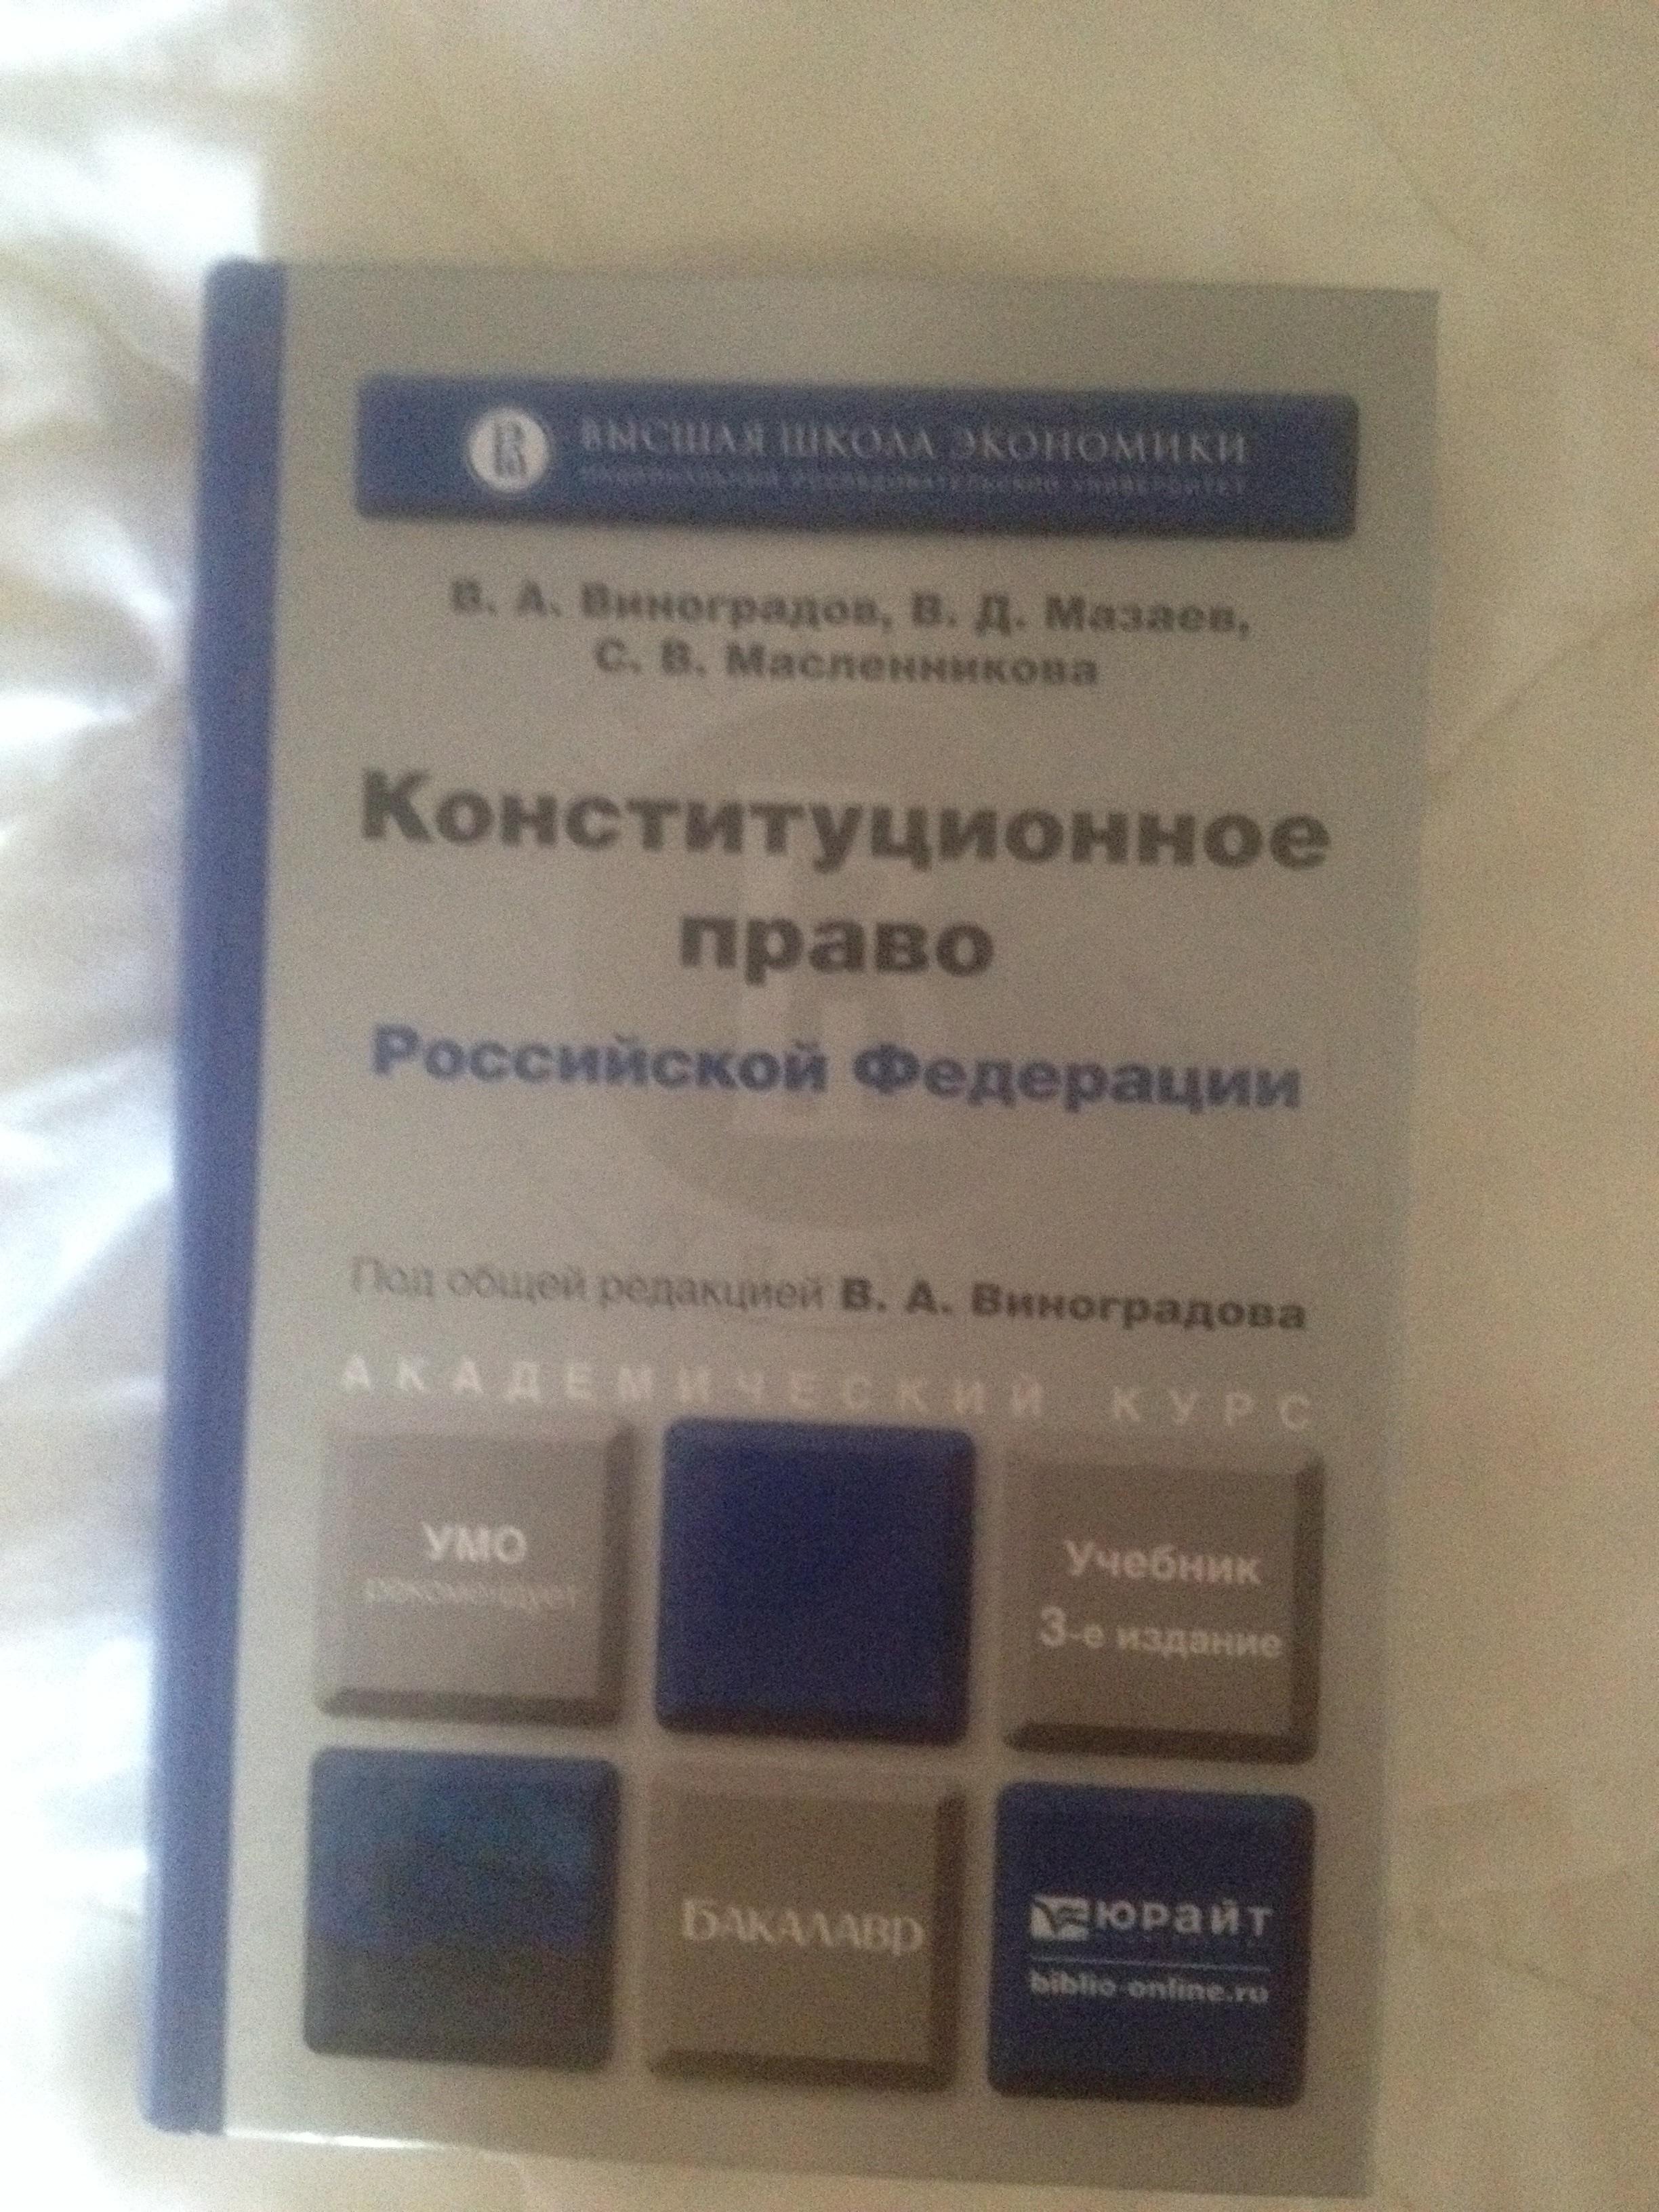 ekonomike-i-organizatsii-stroitelstva-uchebniki-2012